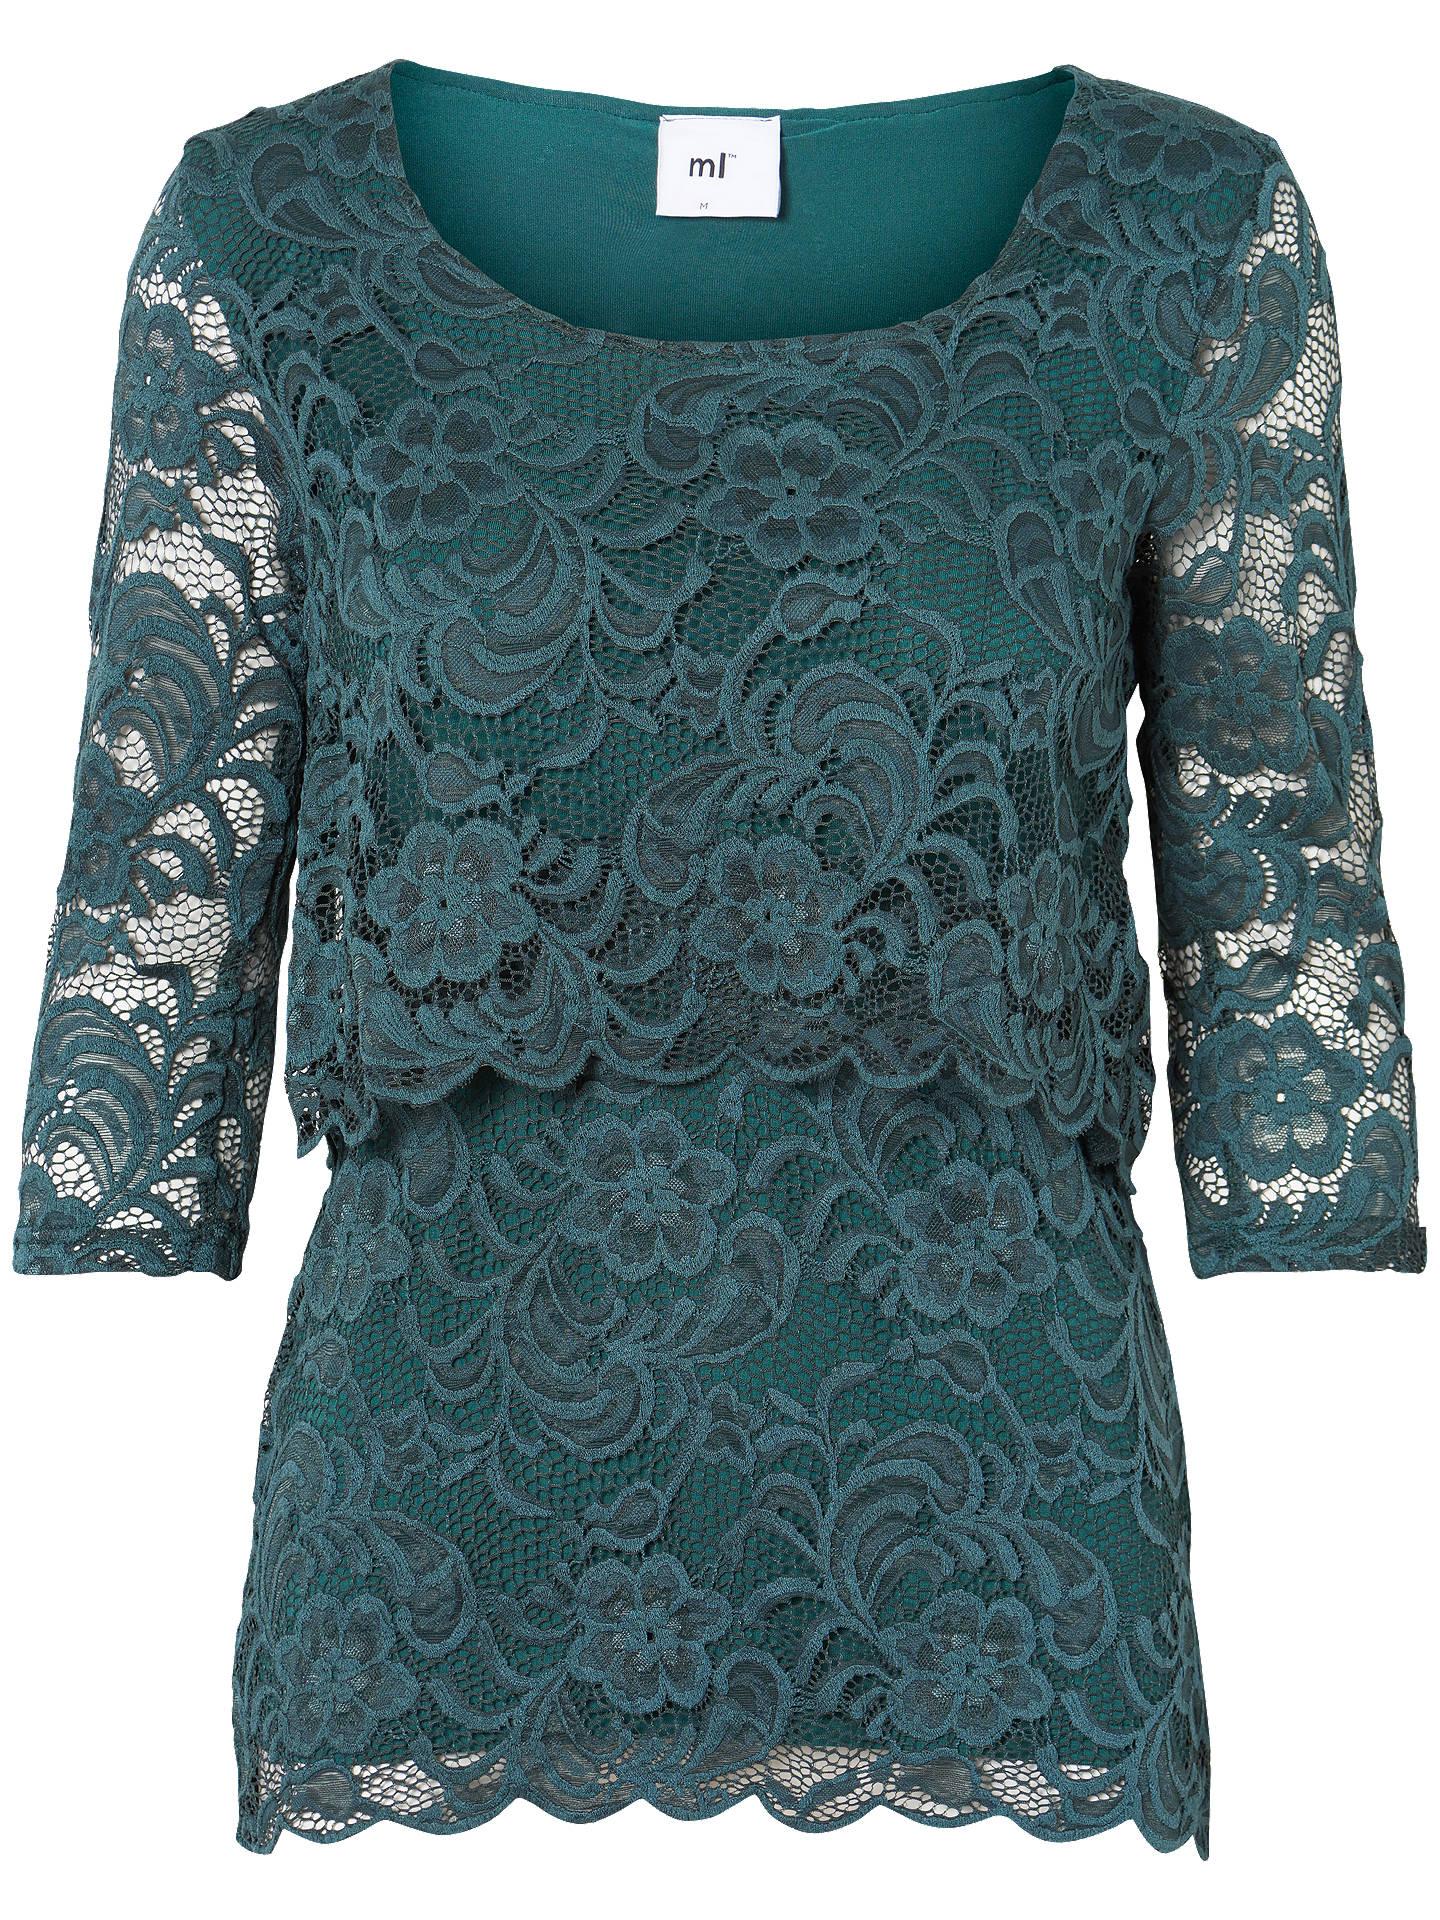 fb793ecd849 Buy Mamalicious Mivane June Lace Overlay Top, Mediterranean Green, S Online  at johnlewis.